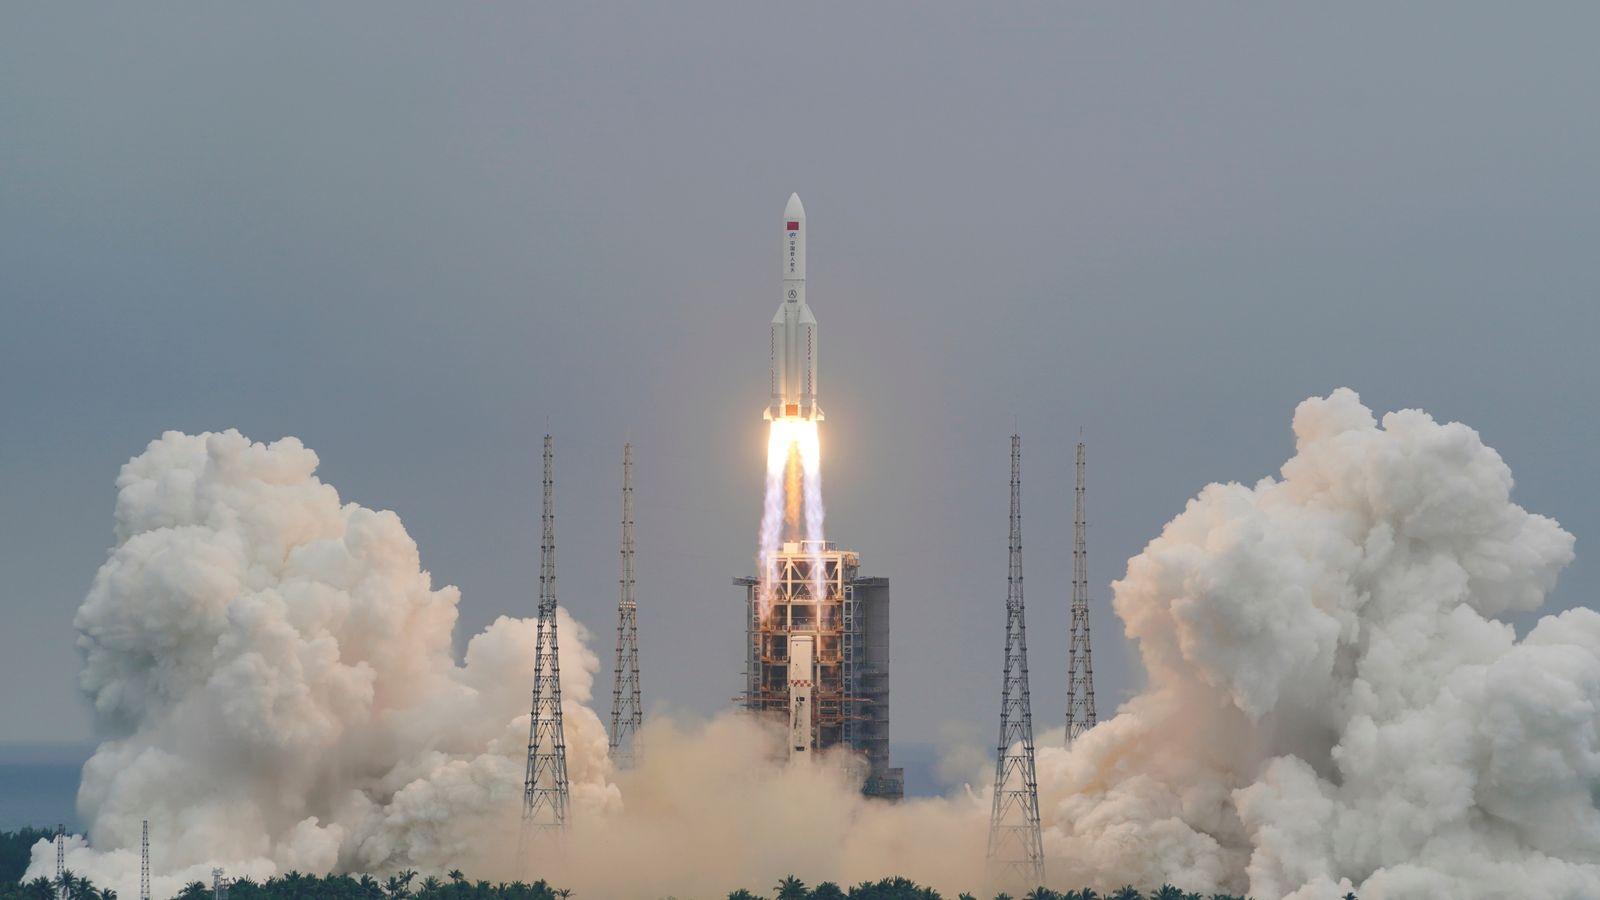 chinese rocket - photo #3